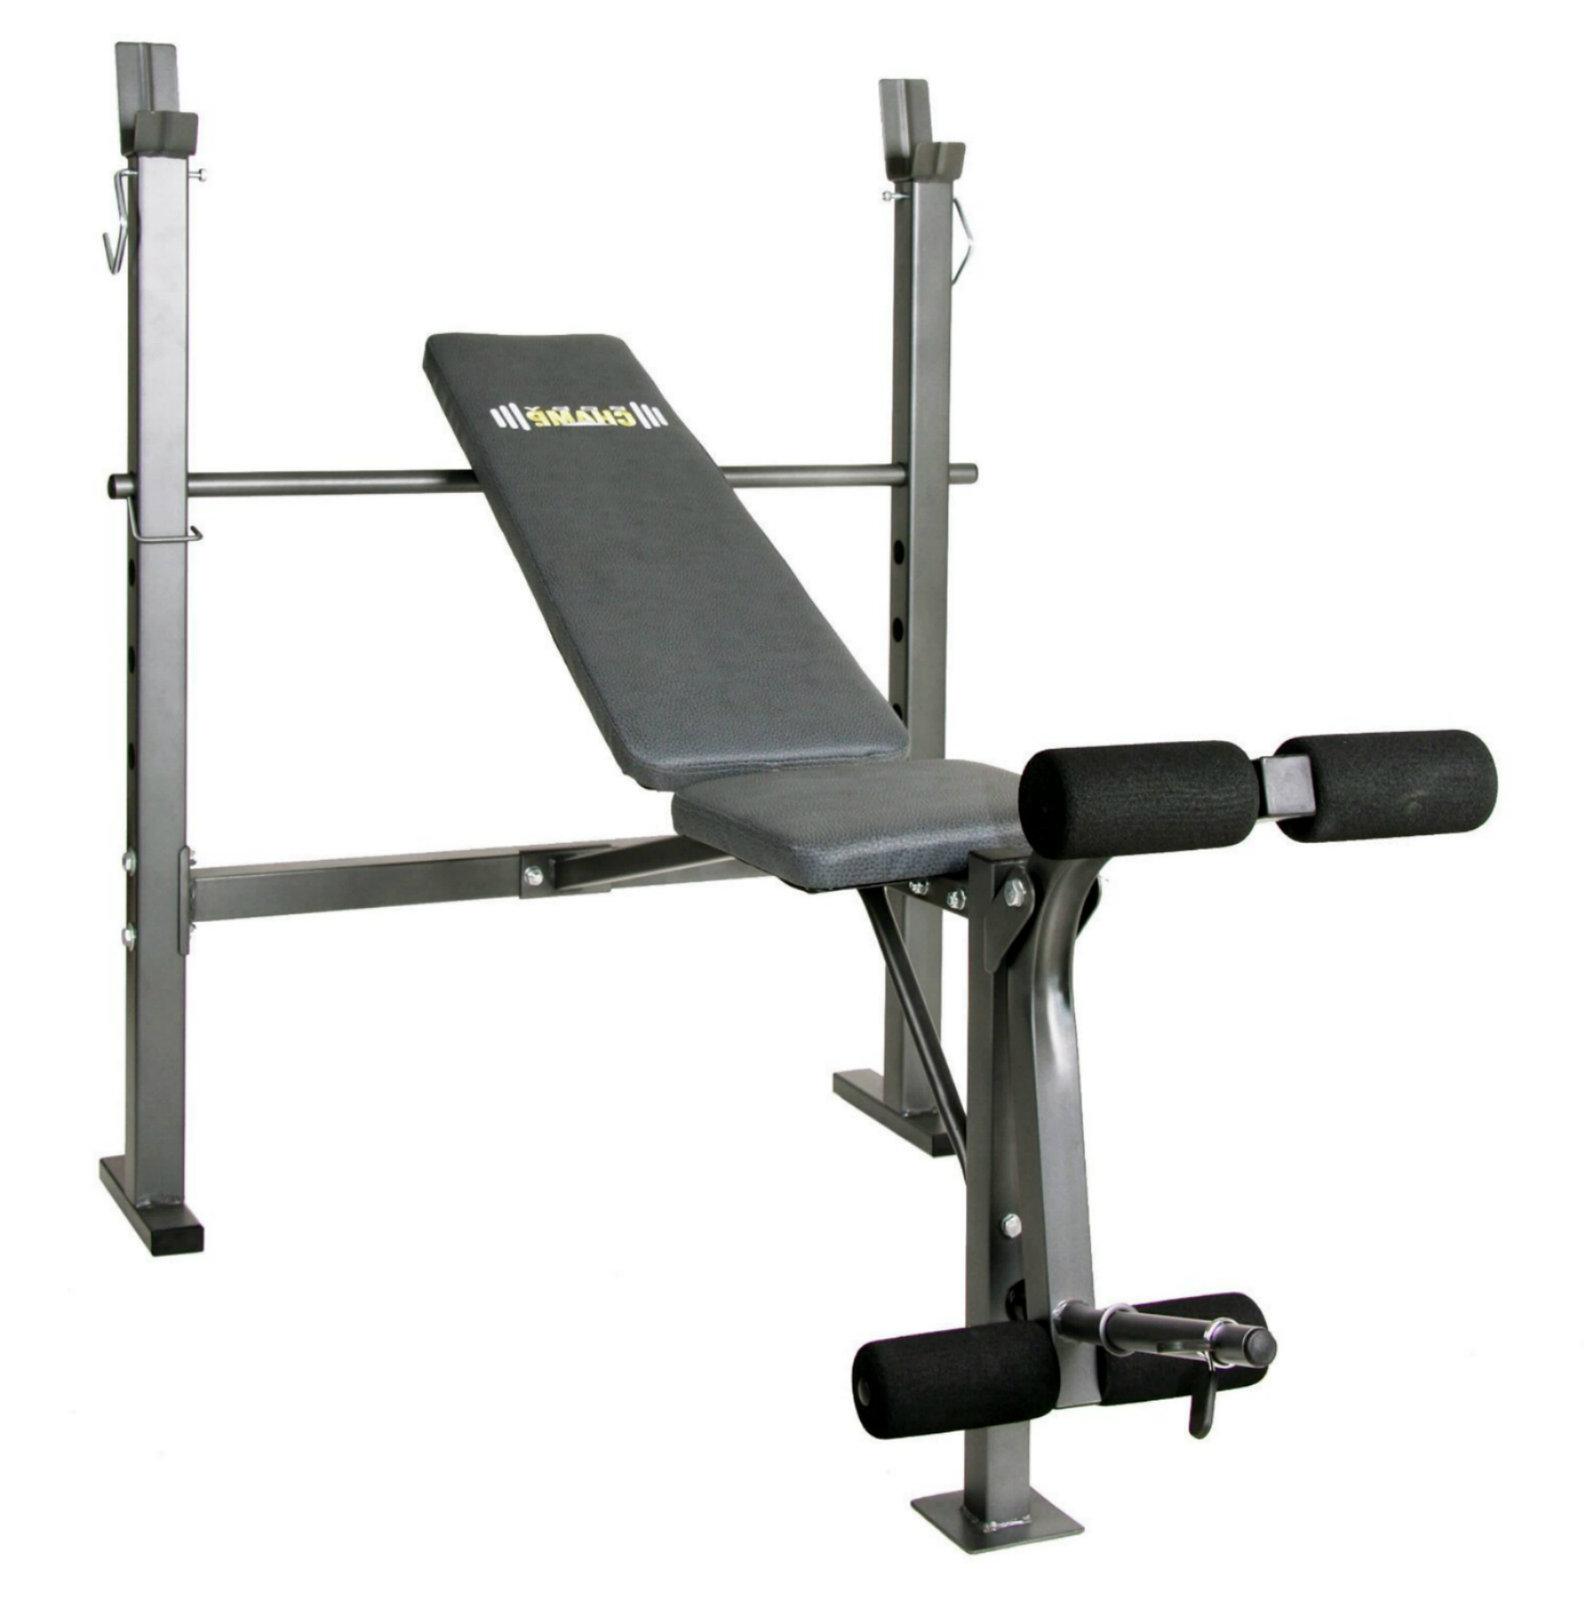 Weight Bench With Leg Developer Body Champ Barbells Set